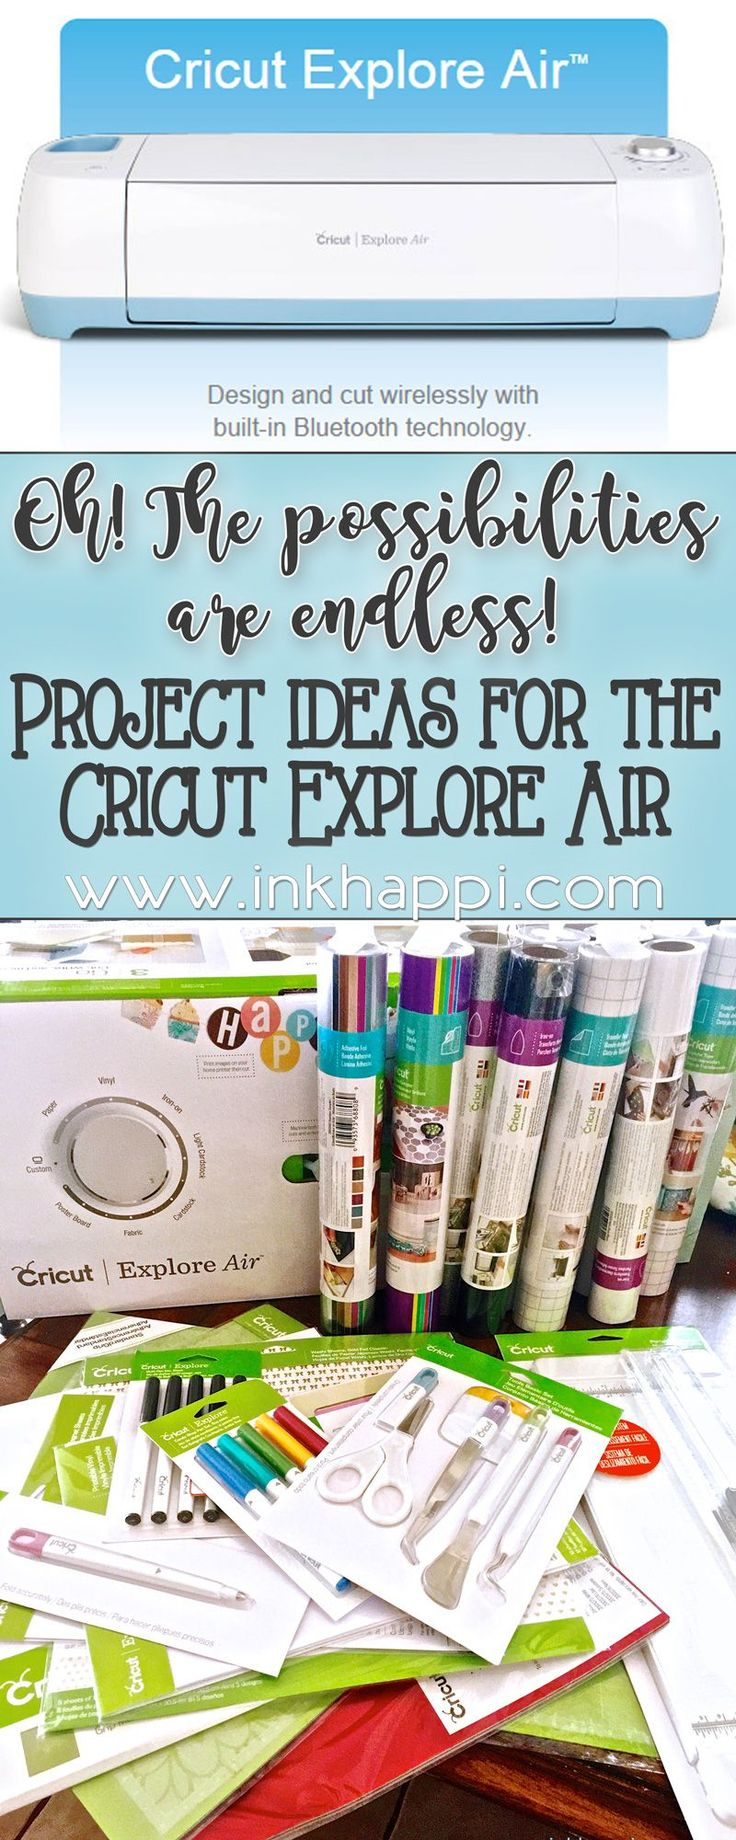 Best 25+ Cricut explore projects ideas on Pinterest | Cricut ...